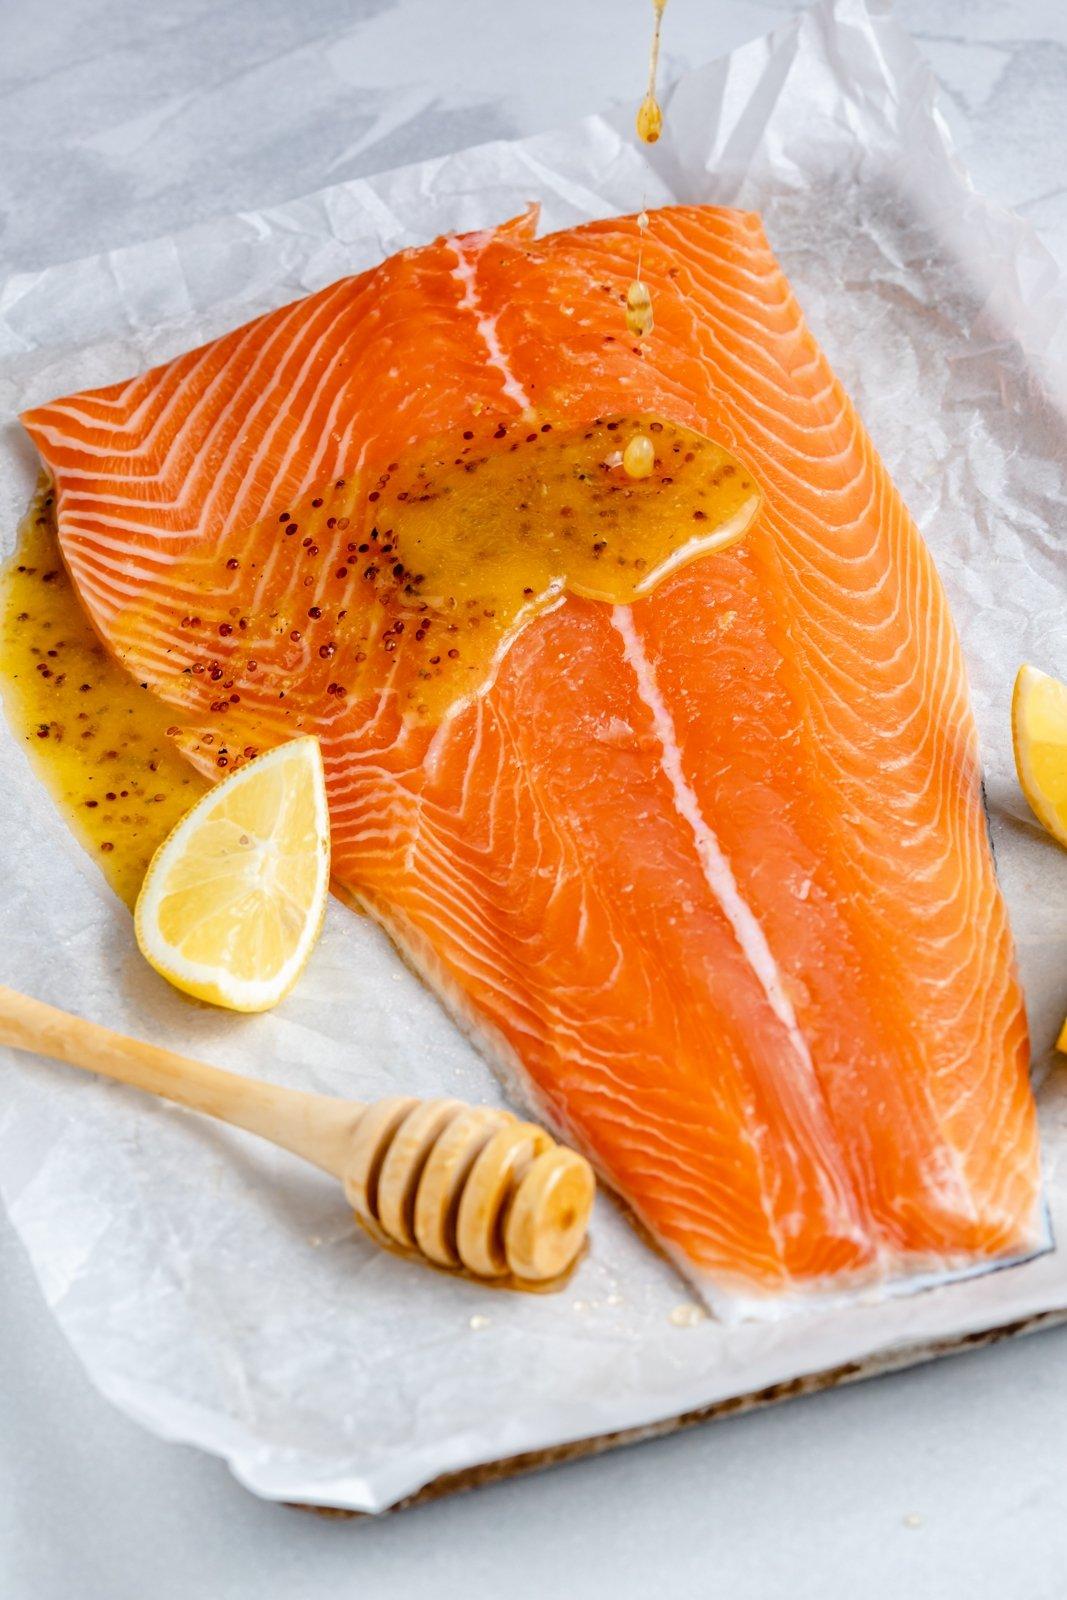 easy lemon garlic salmon unbaked on a baking sheet